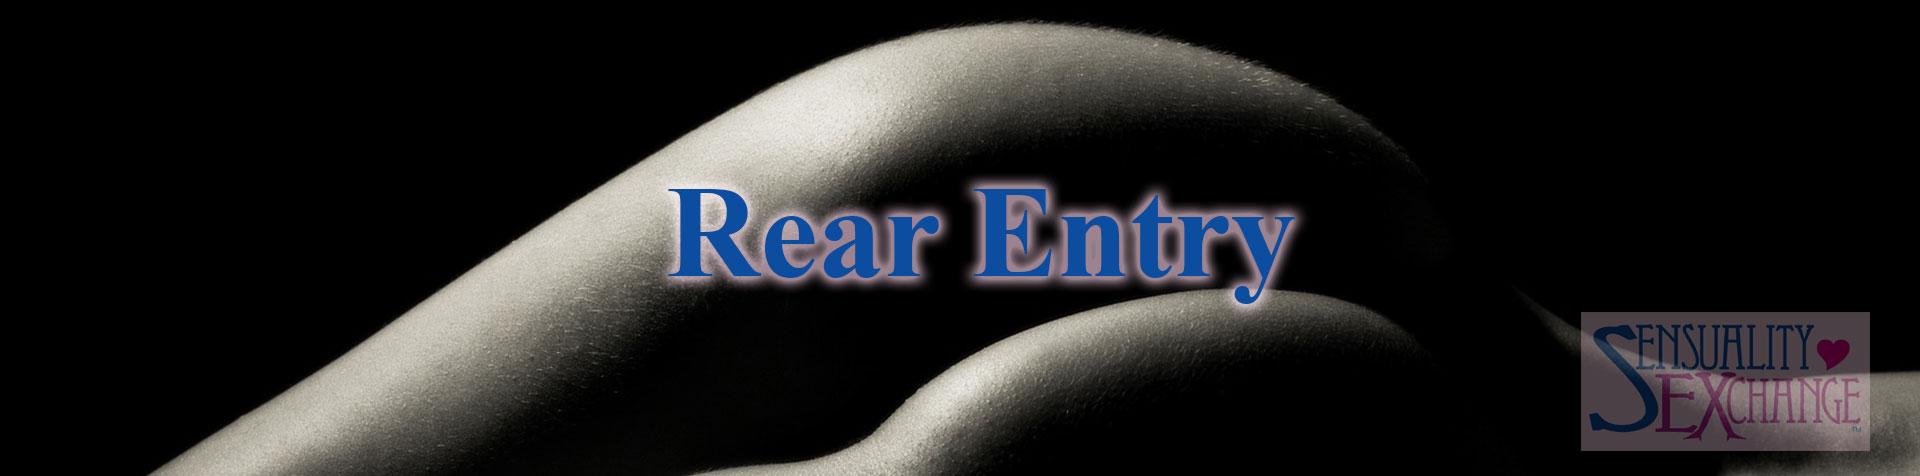 Rear Entry